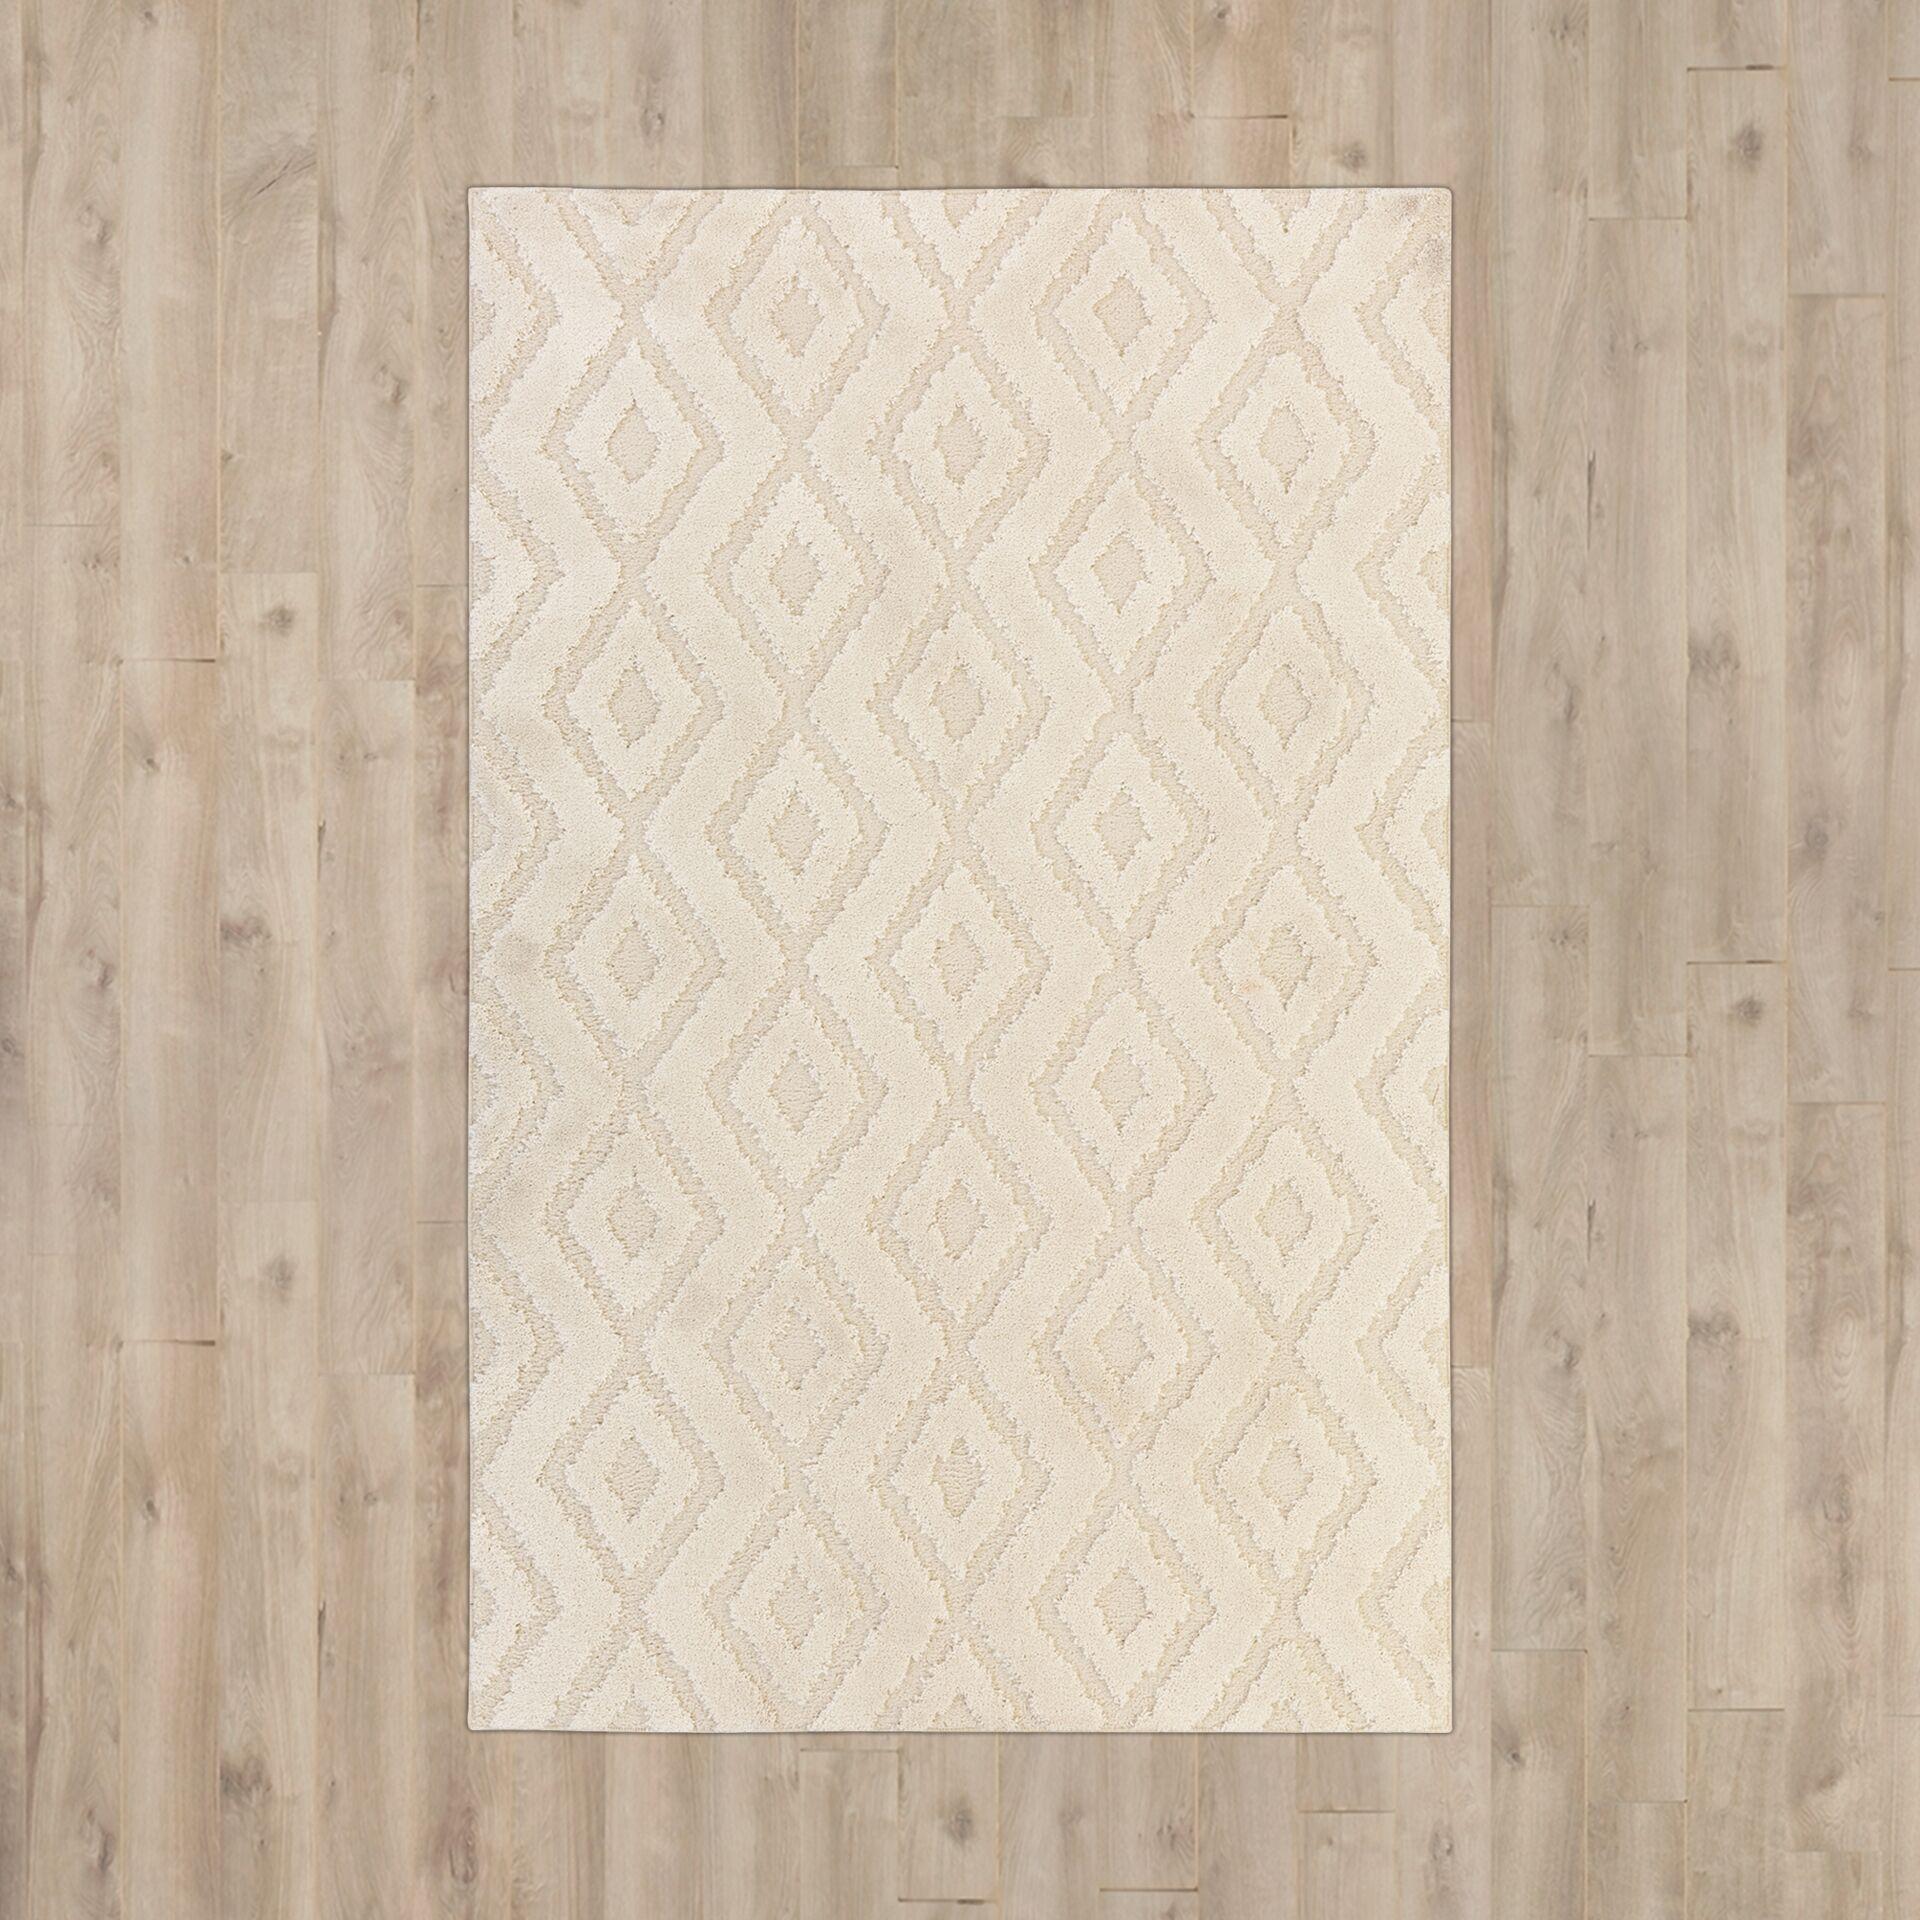 Nickson Cream Area Rug Rug Size: Rectangle 5' x 8'